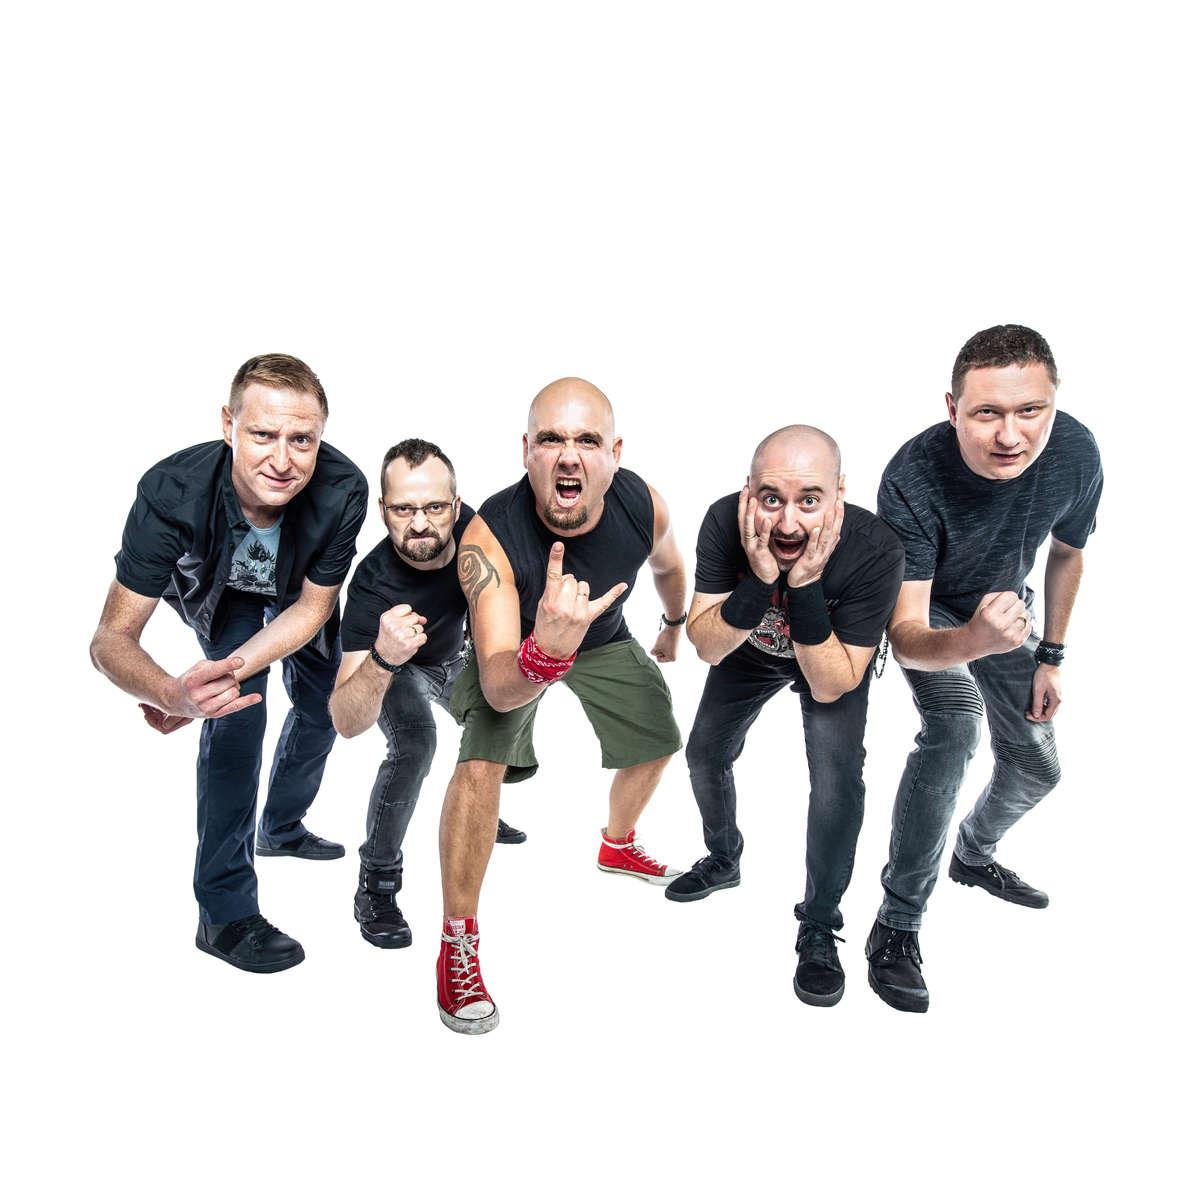 Nowa płyta i trasa Łydki Grubasa!   START - OLSZTYN 14.02.2020! - full image